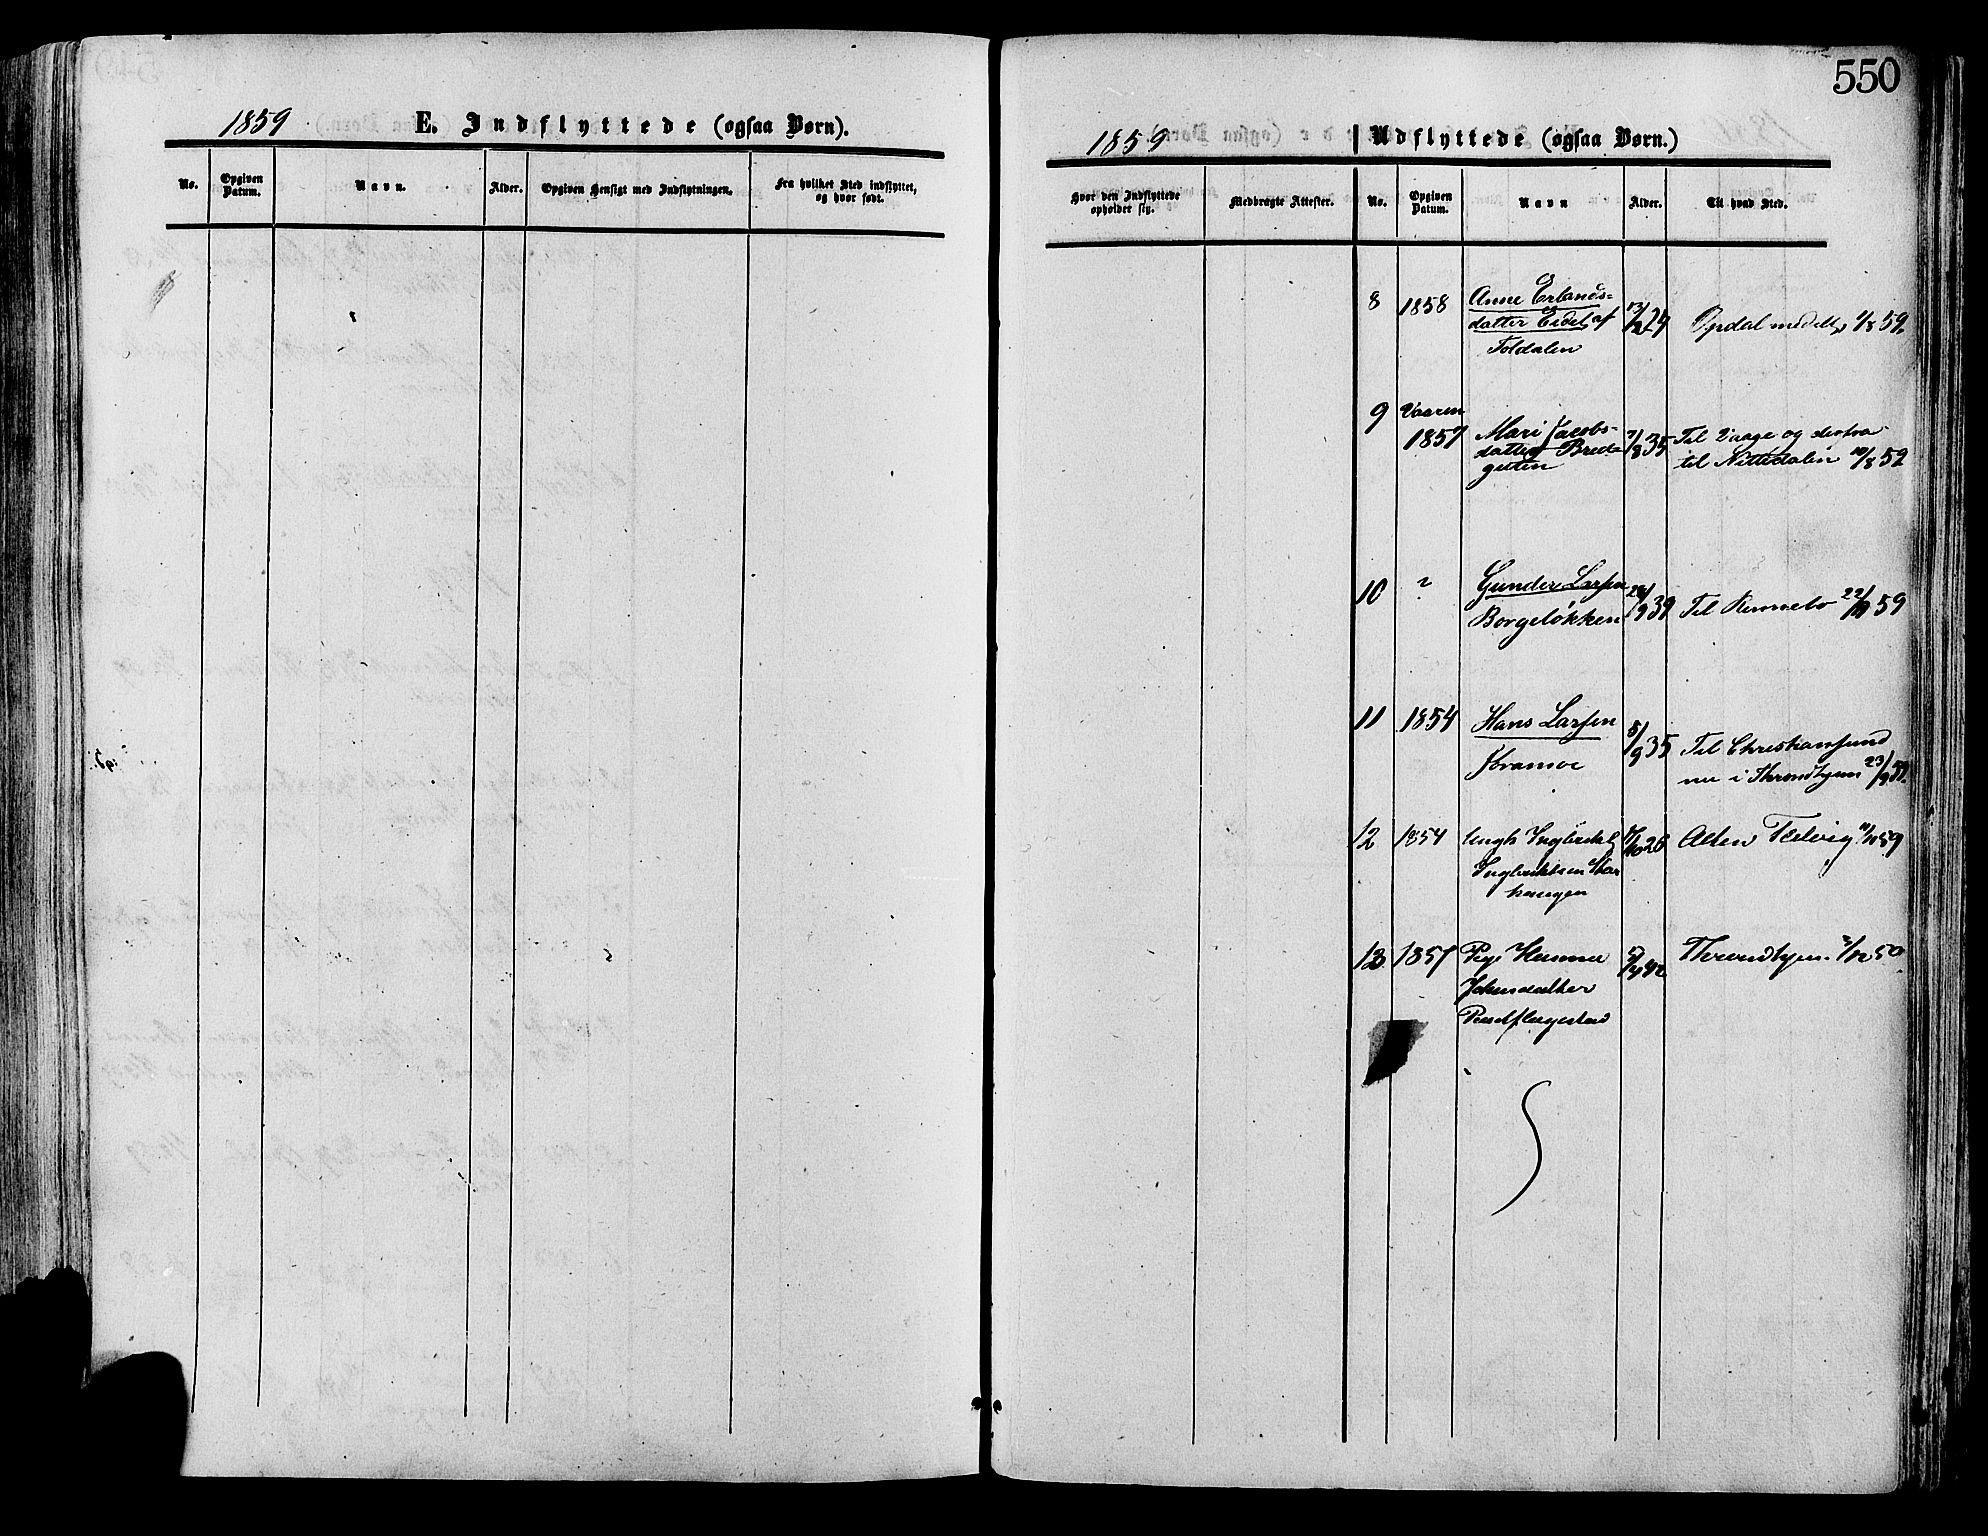 SAH, Lesja prestekontor, Ministerialbok nr. 8, 1854-1880, s. 550